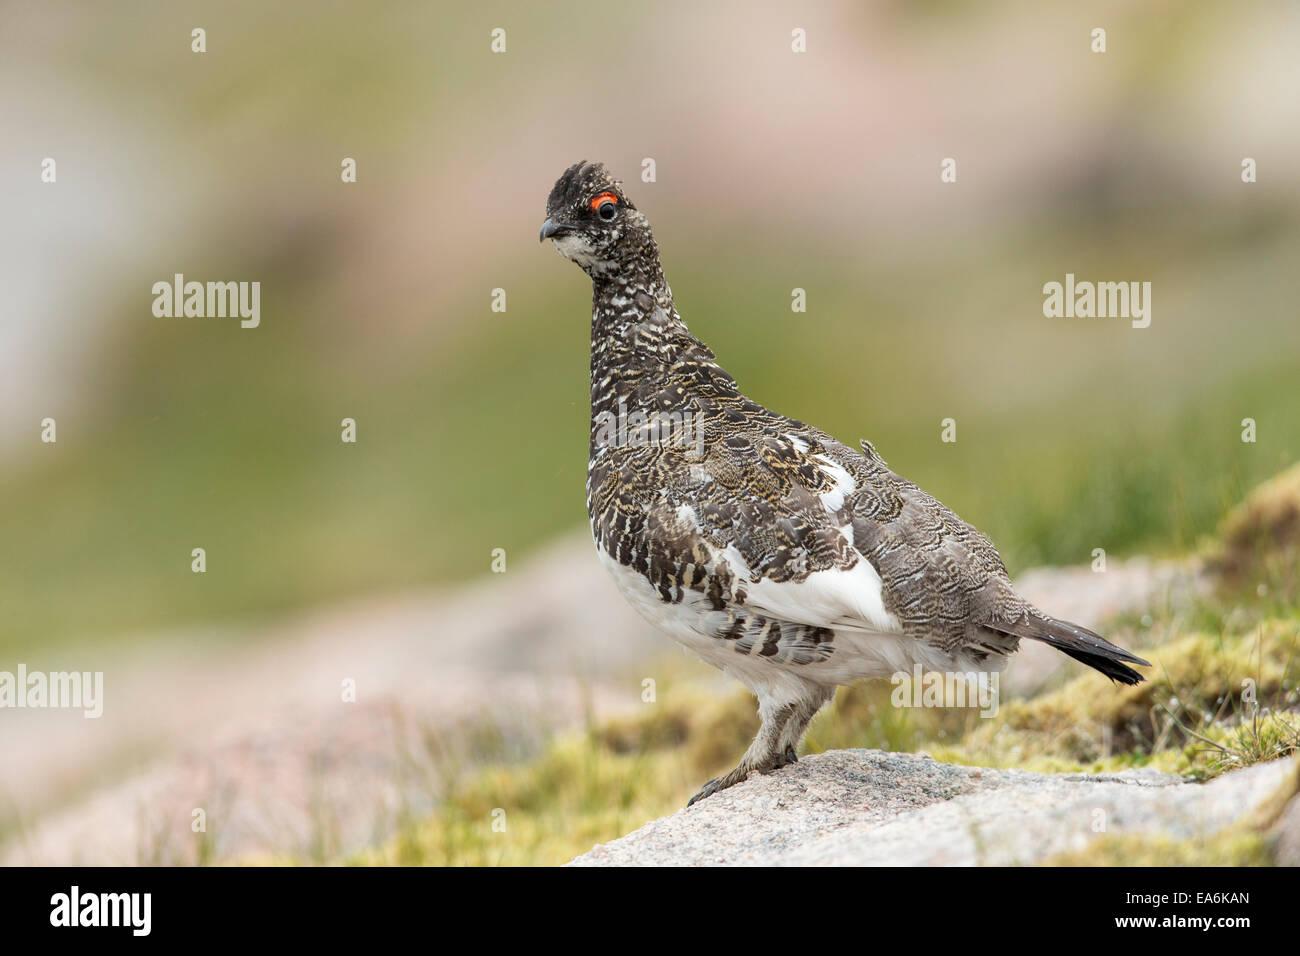 Ptarmigan (Lagopus mutus) adult male in summer plumage in upland habitat - Stock Image